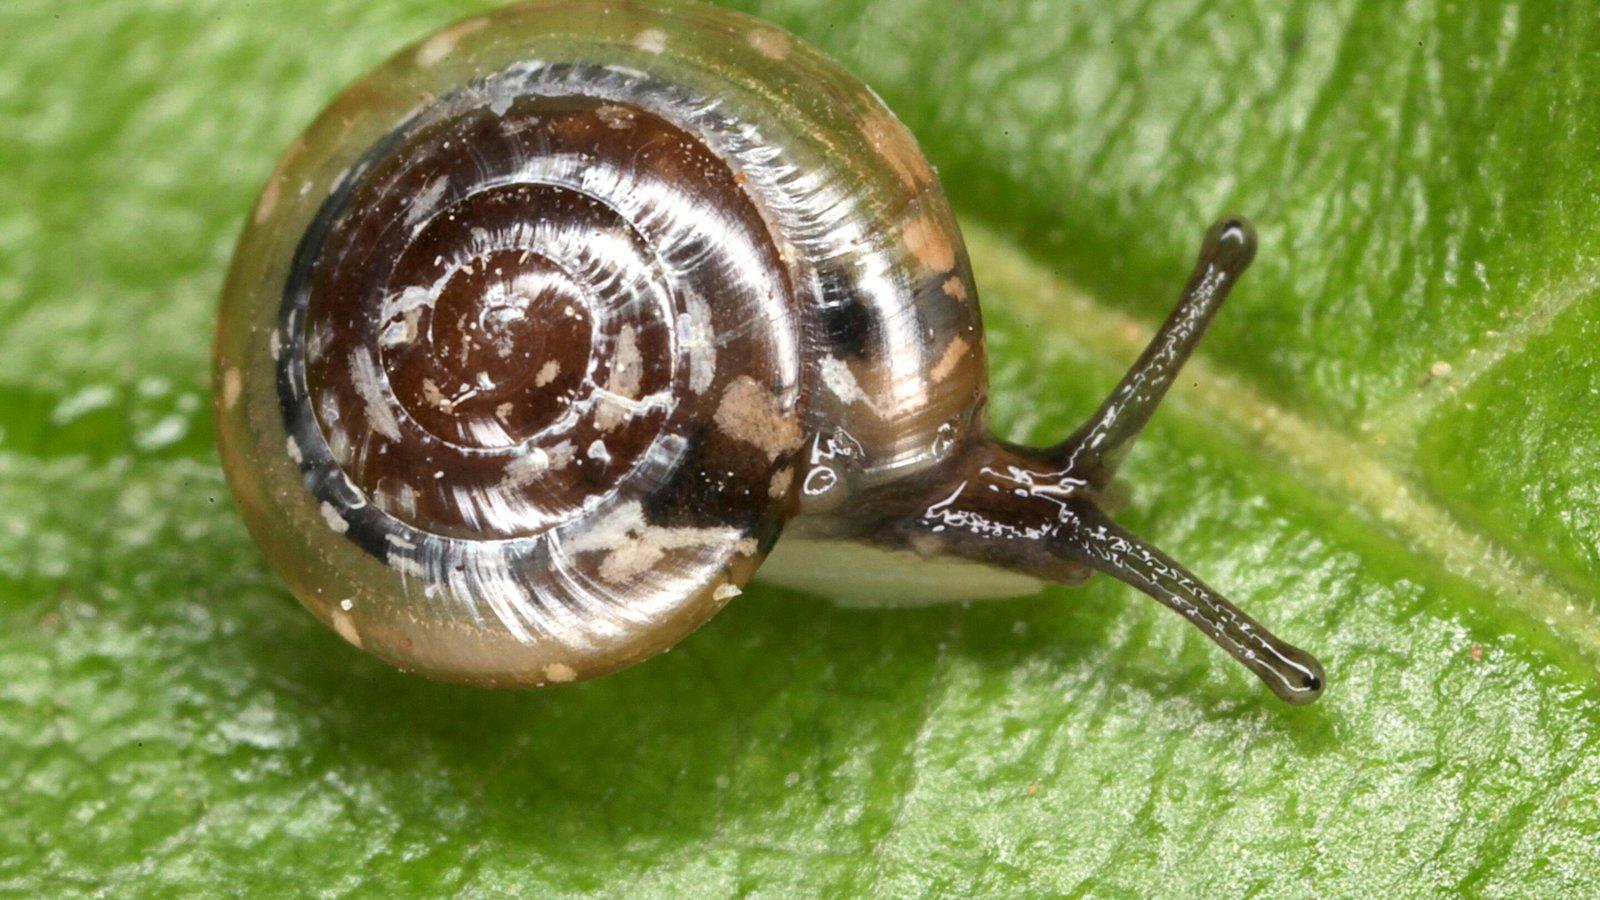 Allenoconcha basispiralis, one of Norfolk Island's endemic snails